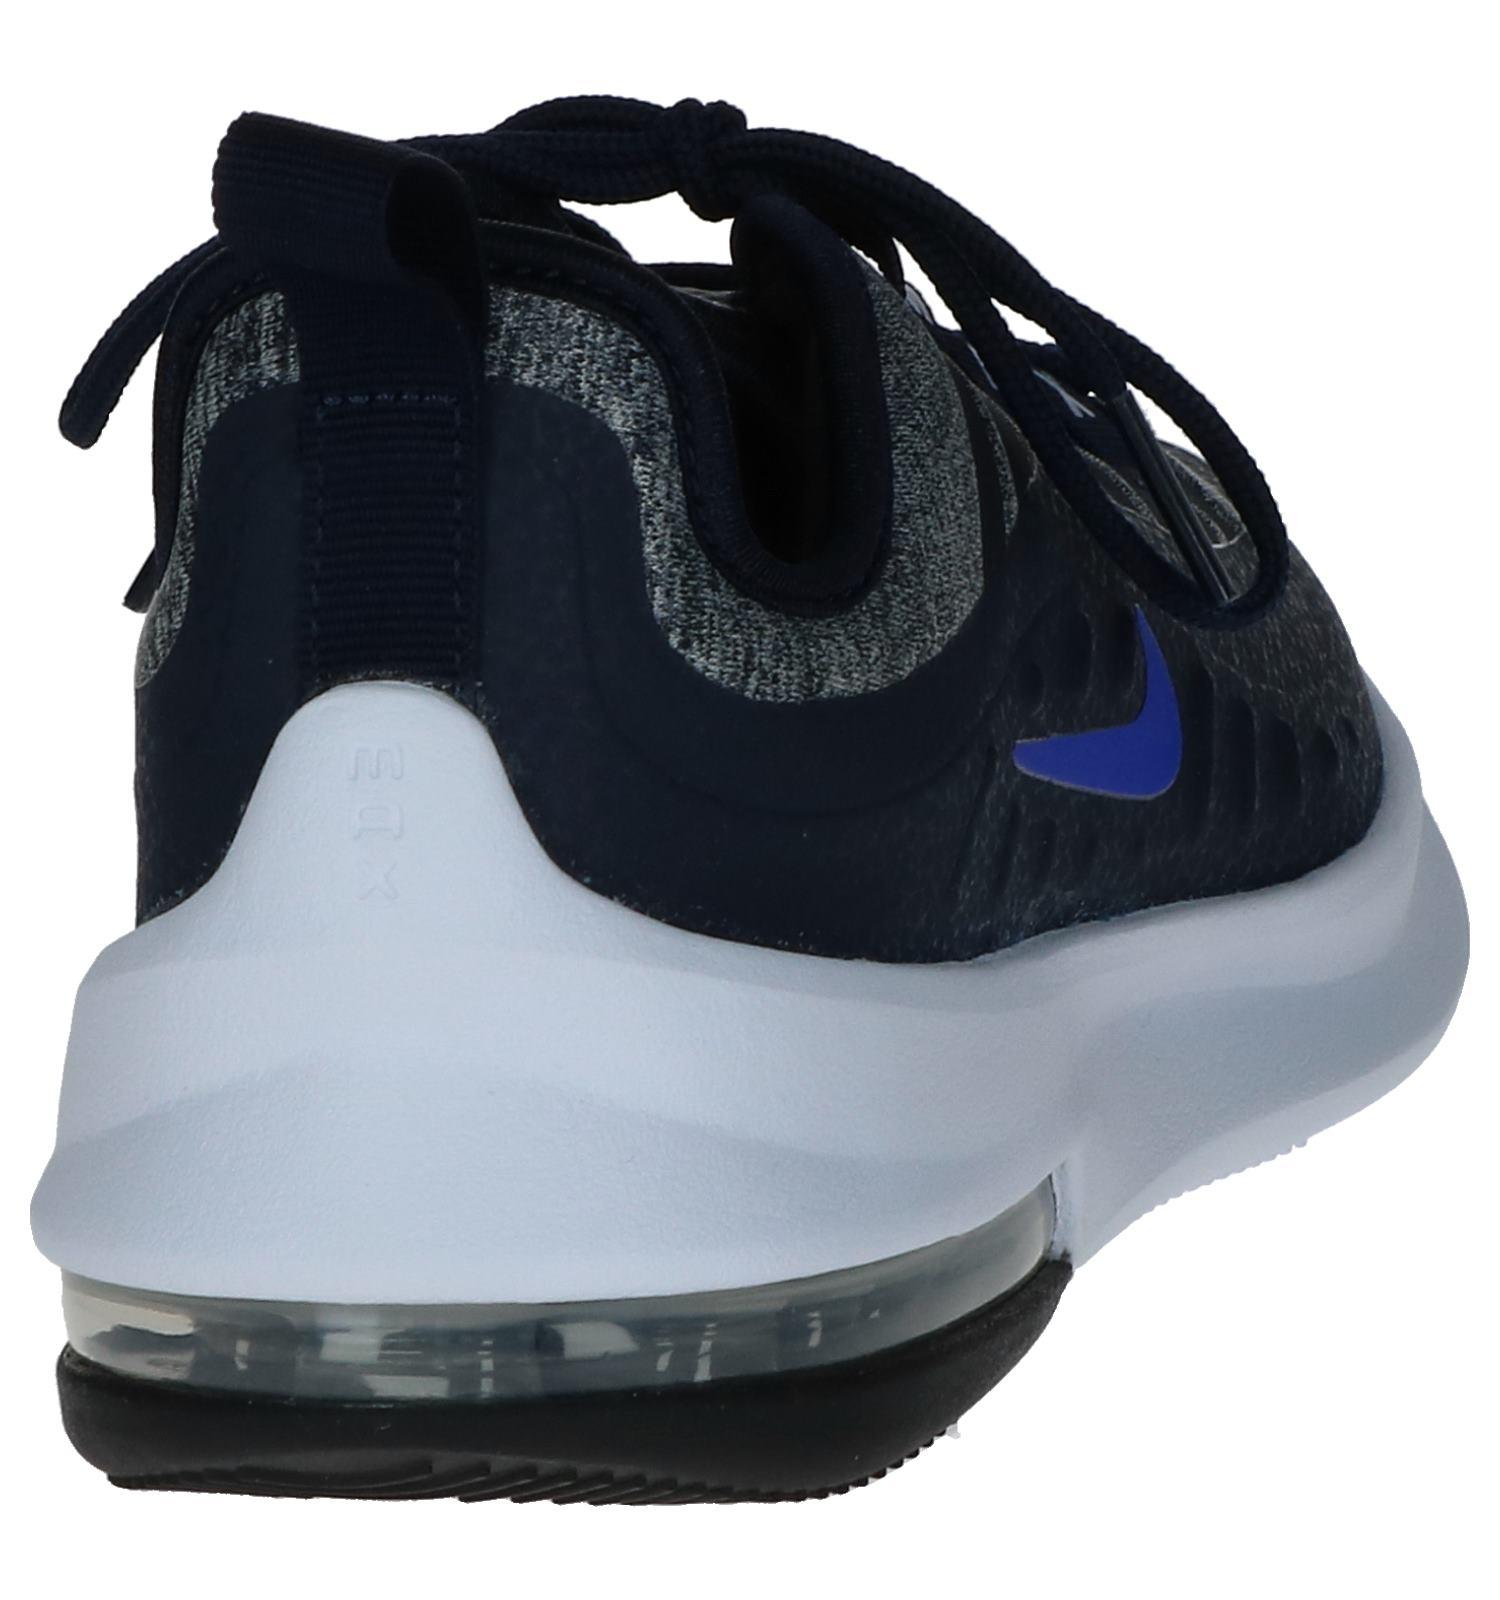 the latest dca10 efa16 Donkerblauwe Nike Air Max Lage Sneakers  TORFS.BE  Gratis verzend en  retour